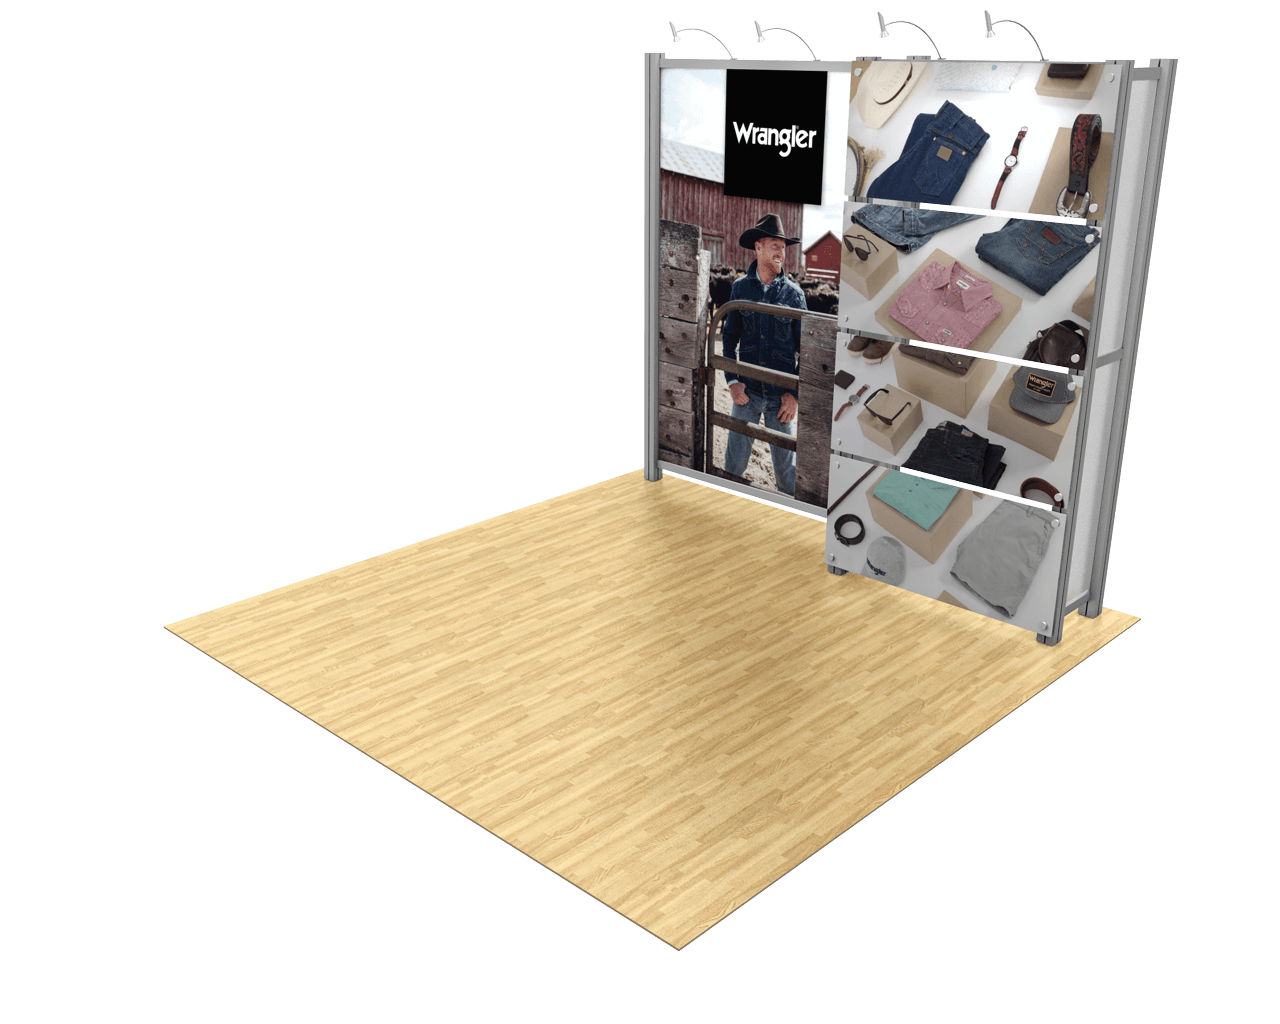 XVline XV5 10ft Trade Show Display Model